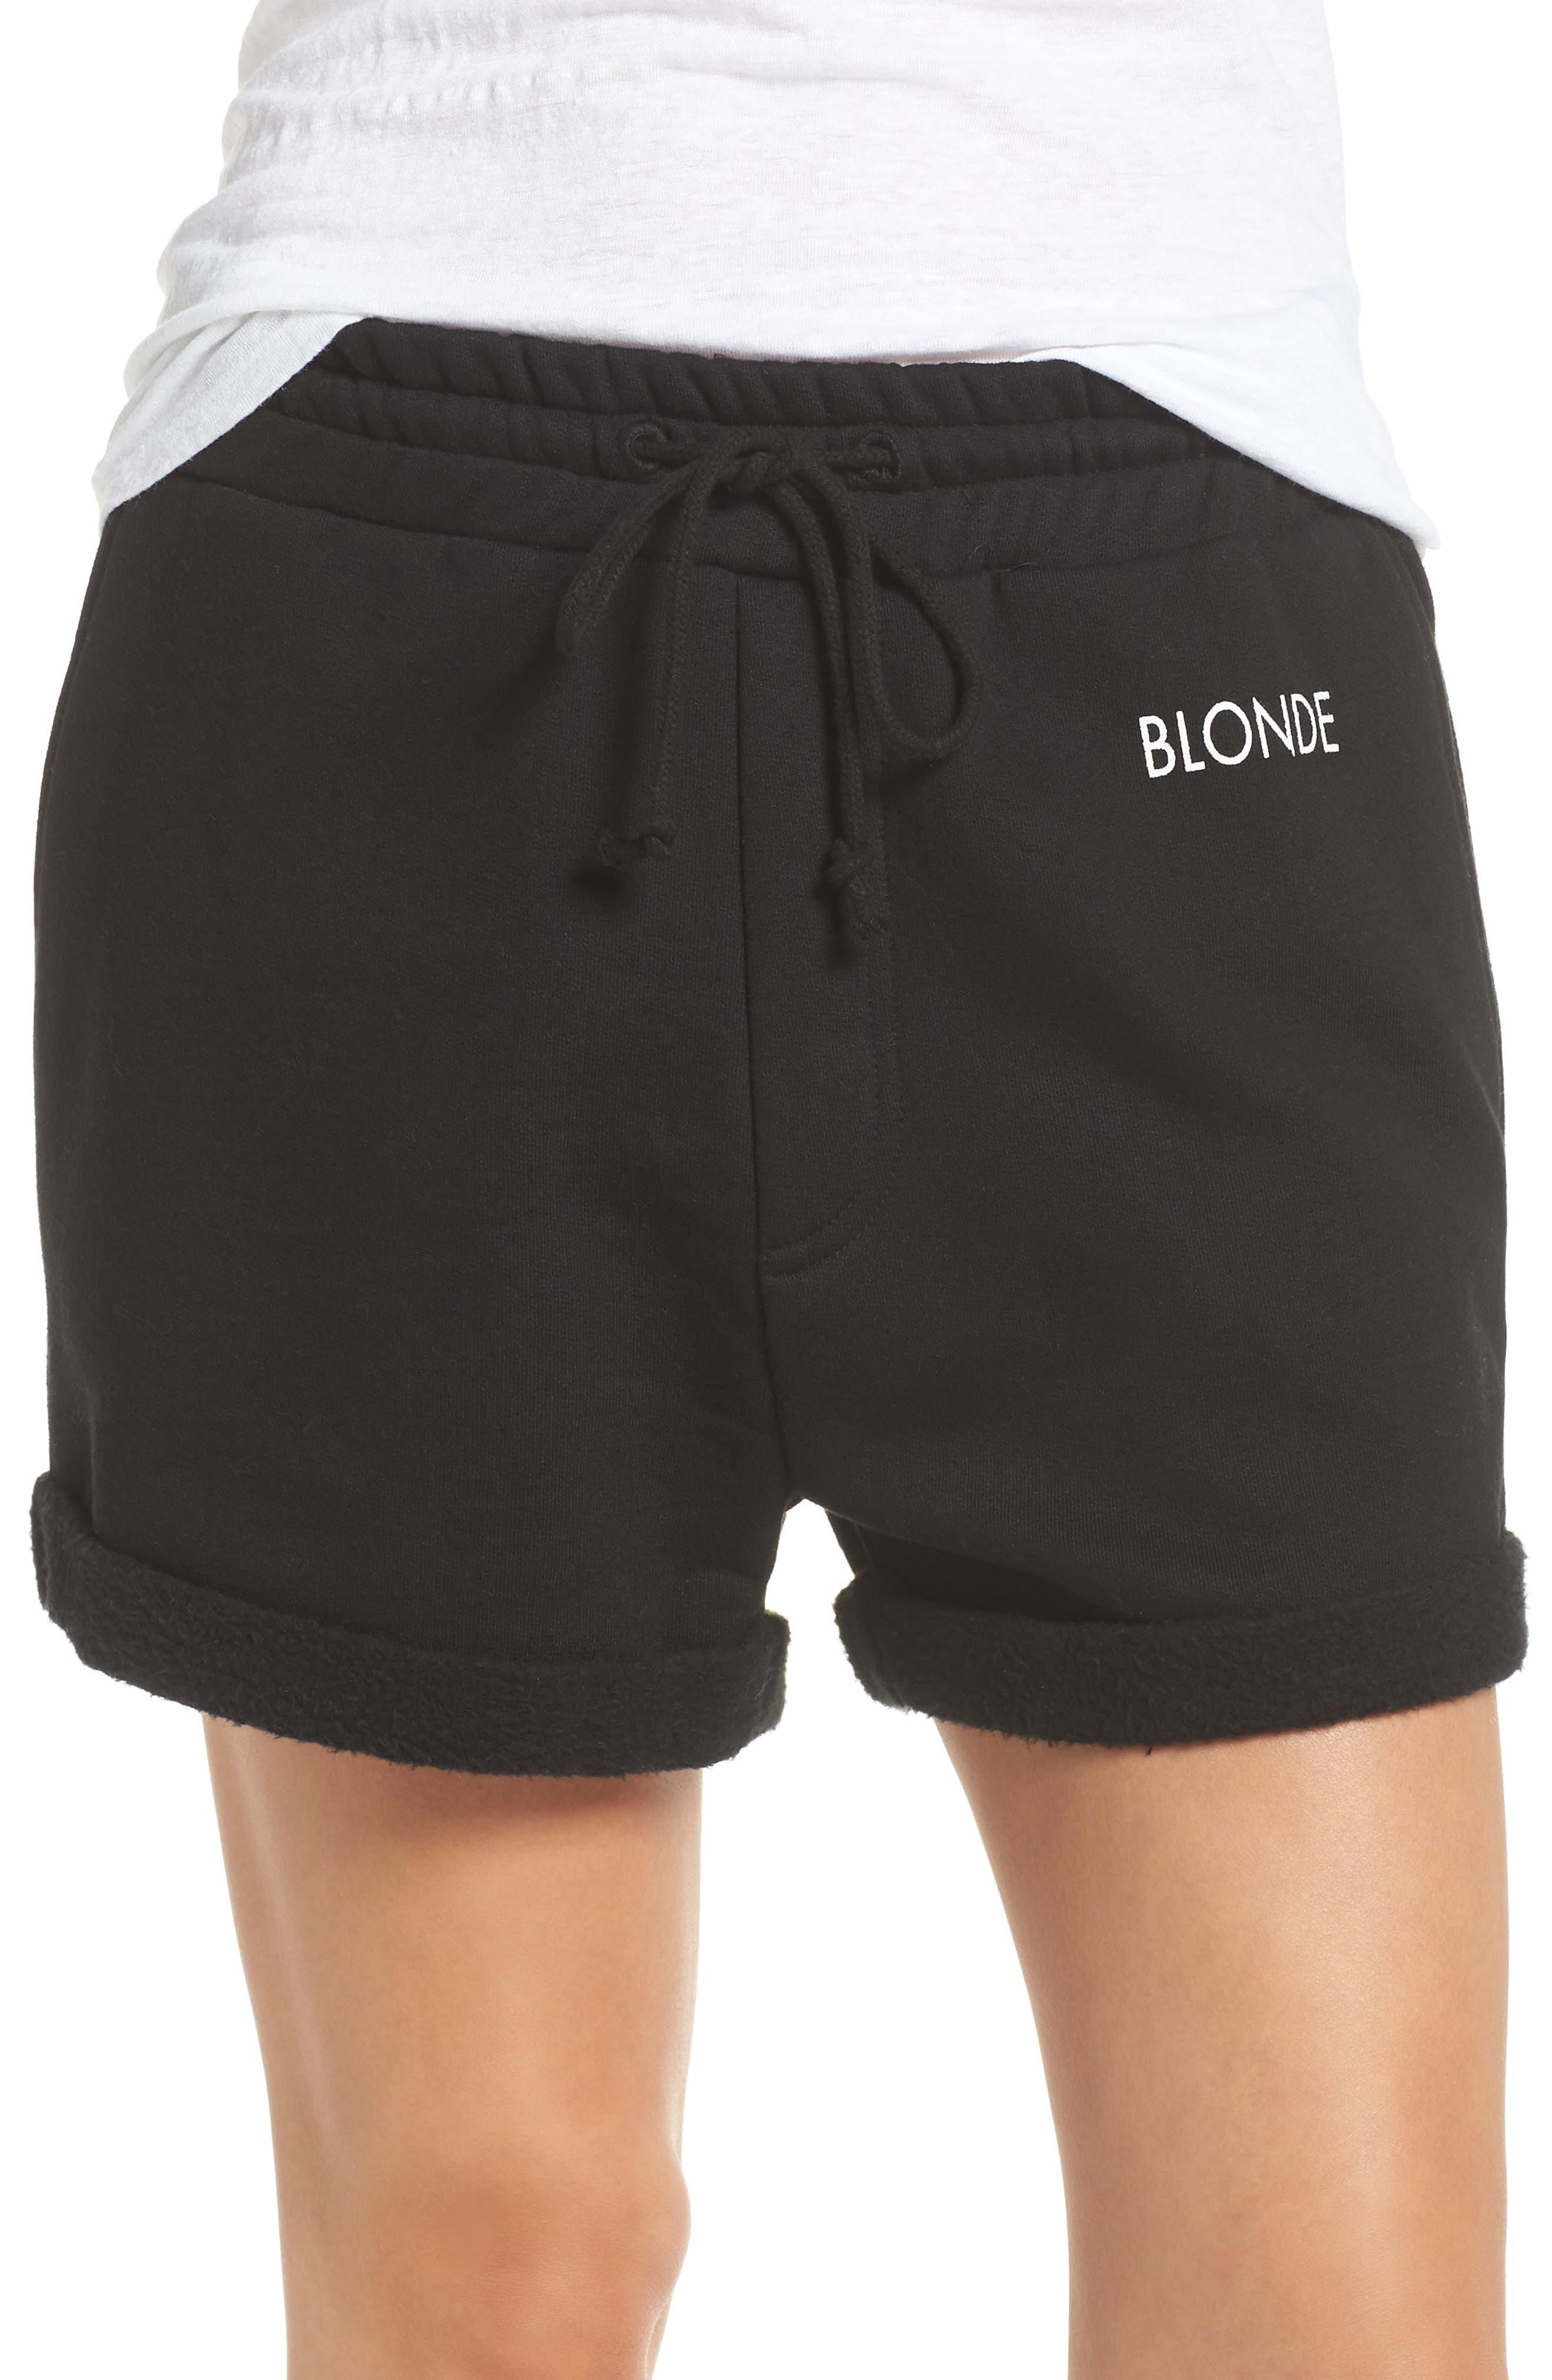 Blonde Lounge Shorts,                         Main,                         color, 008